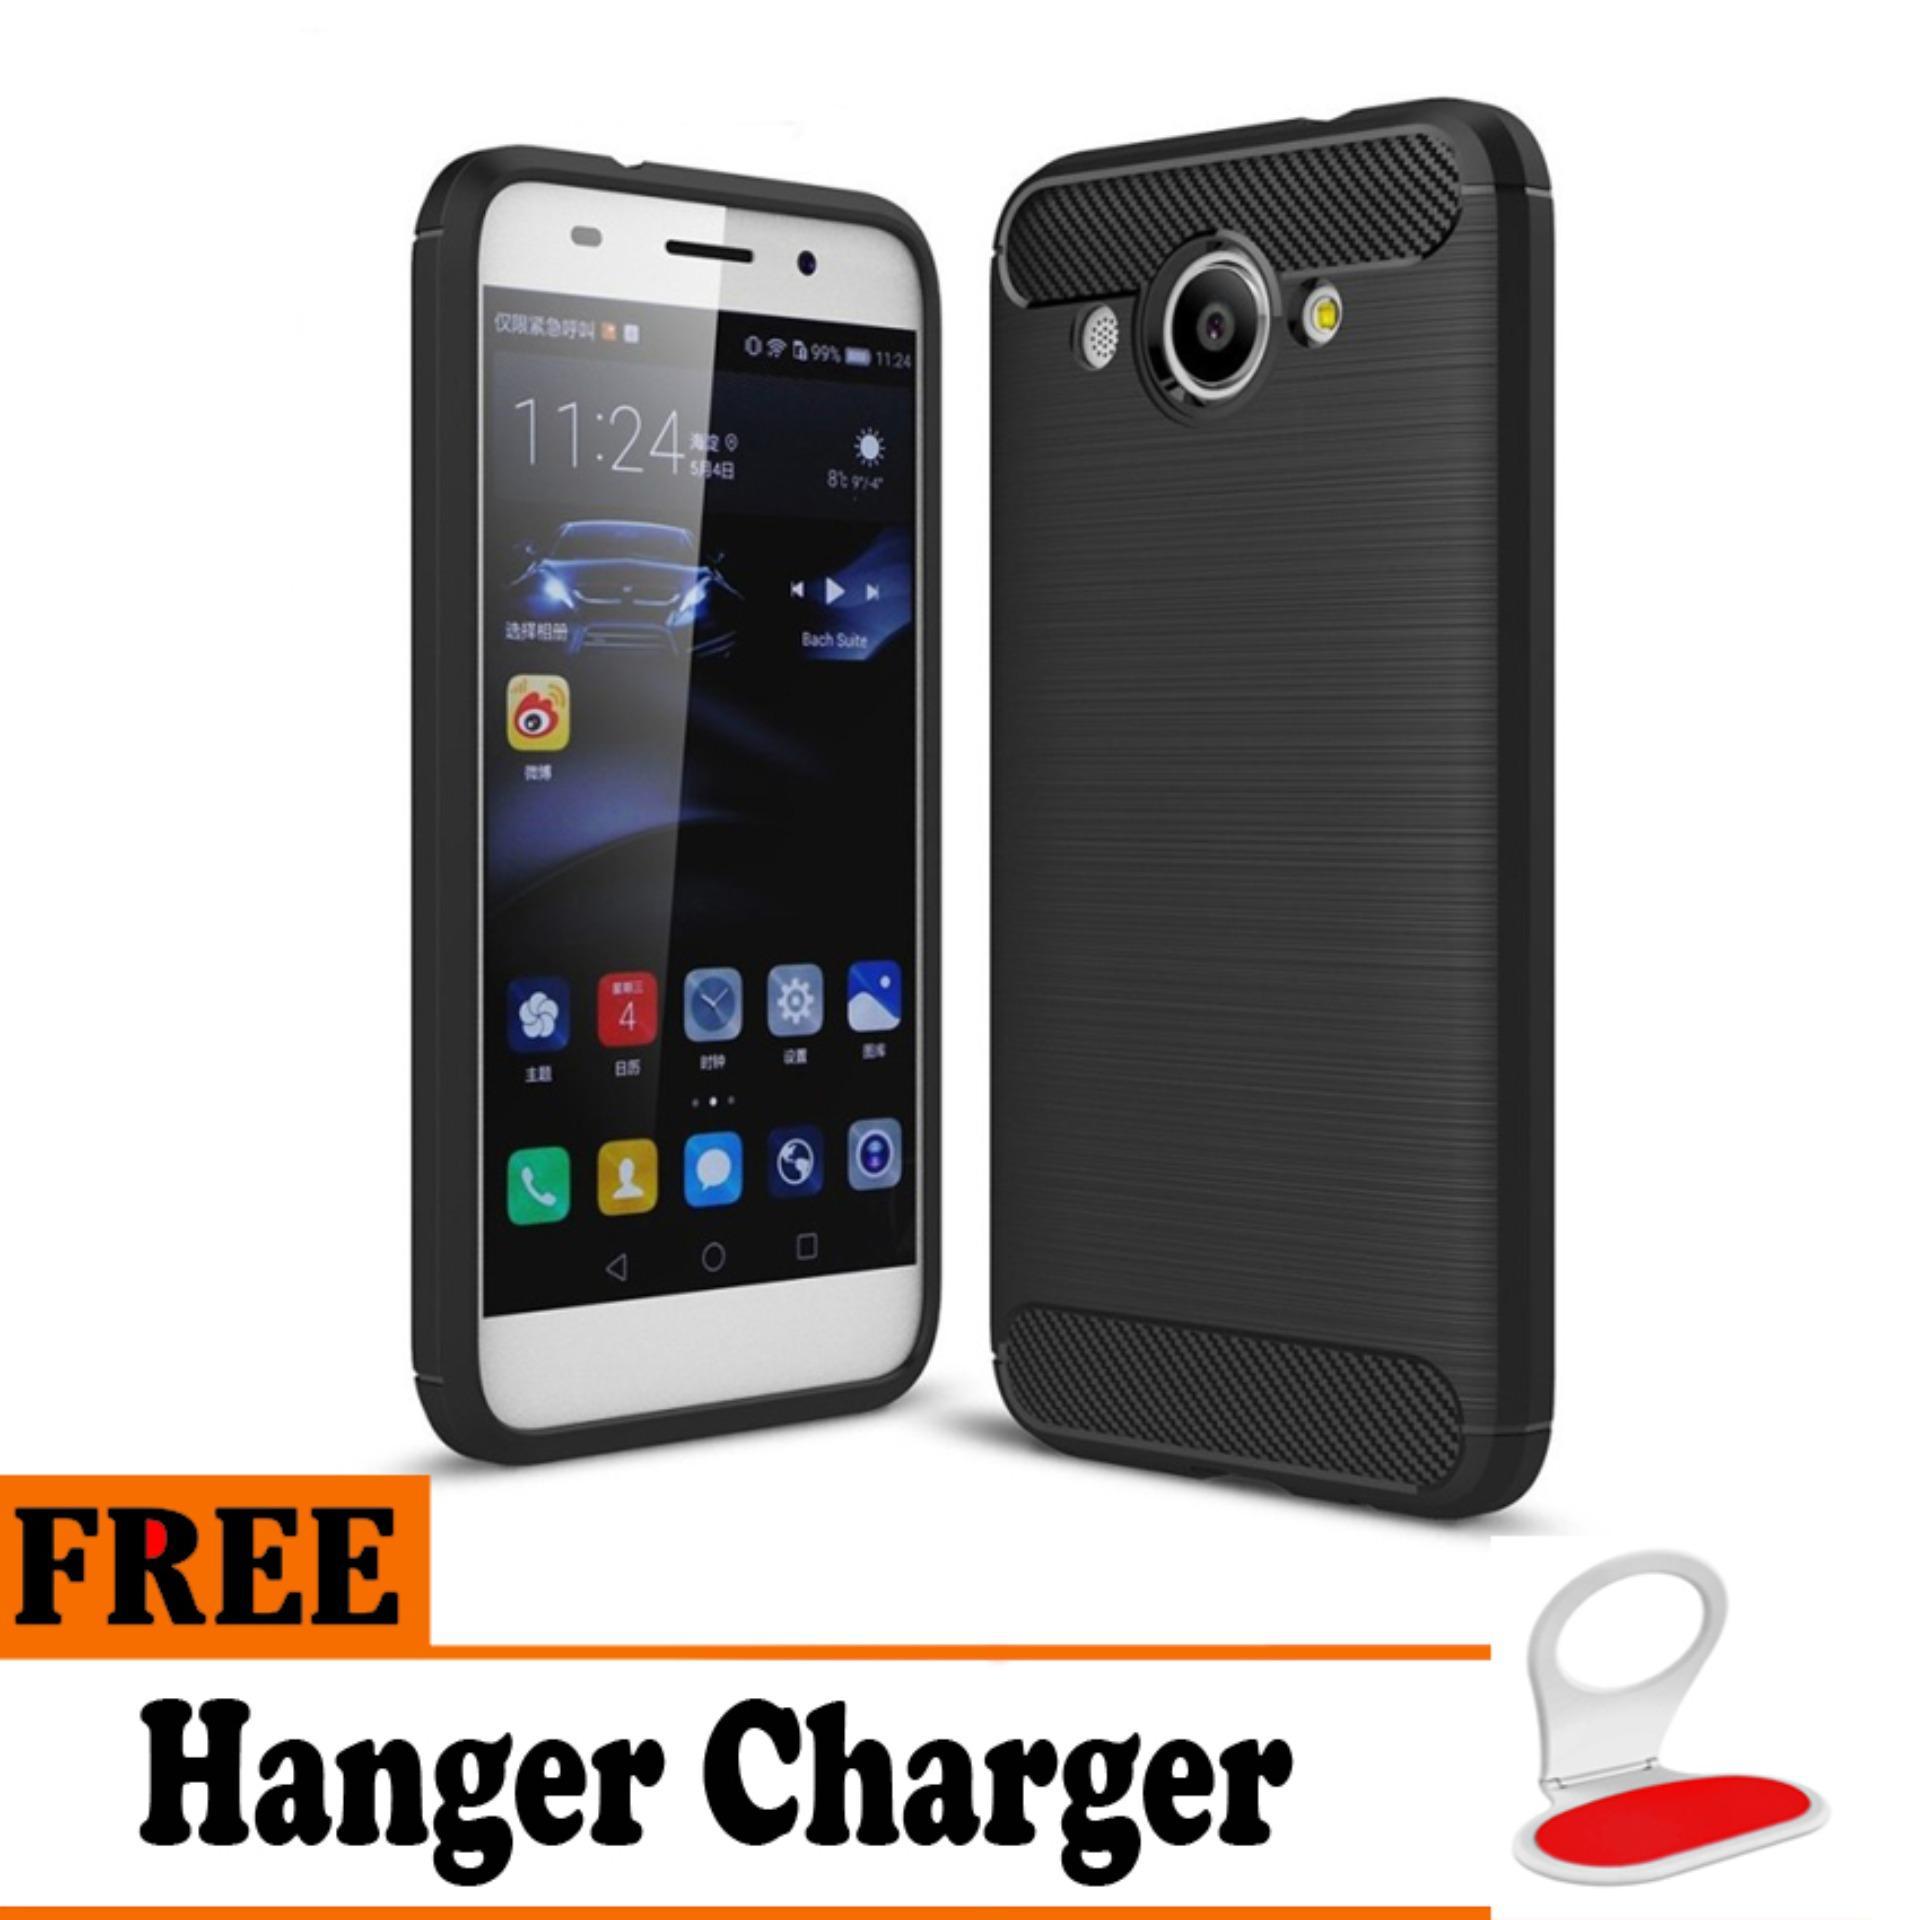 Softcase Ipaky Shockproof Matte Black karbon untuk Huawei Y3 2017   - Free Hanger Charger